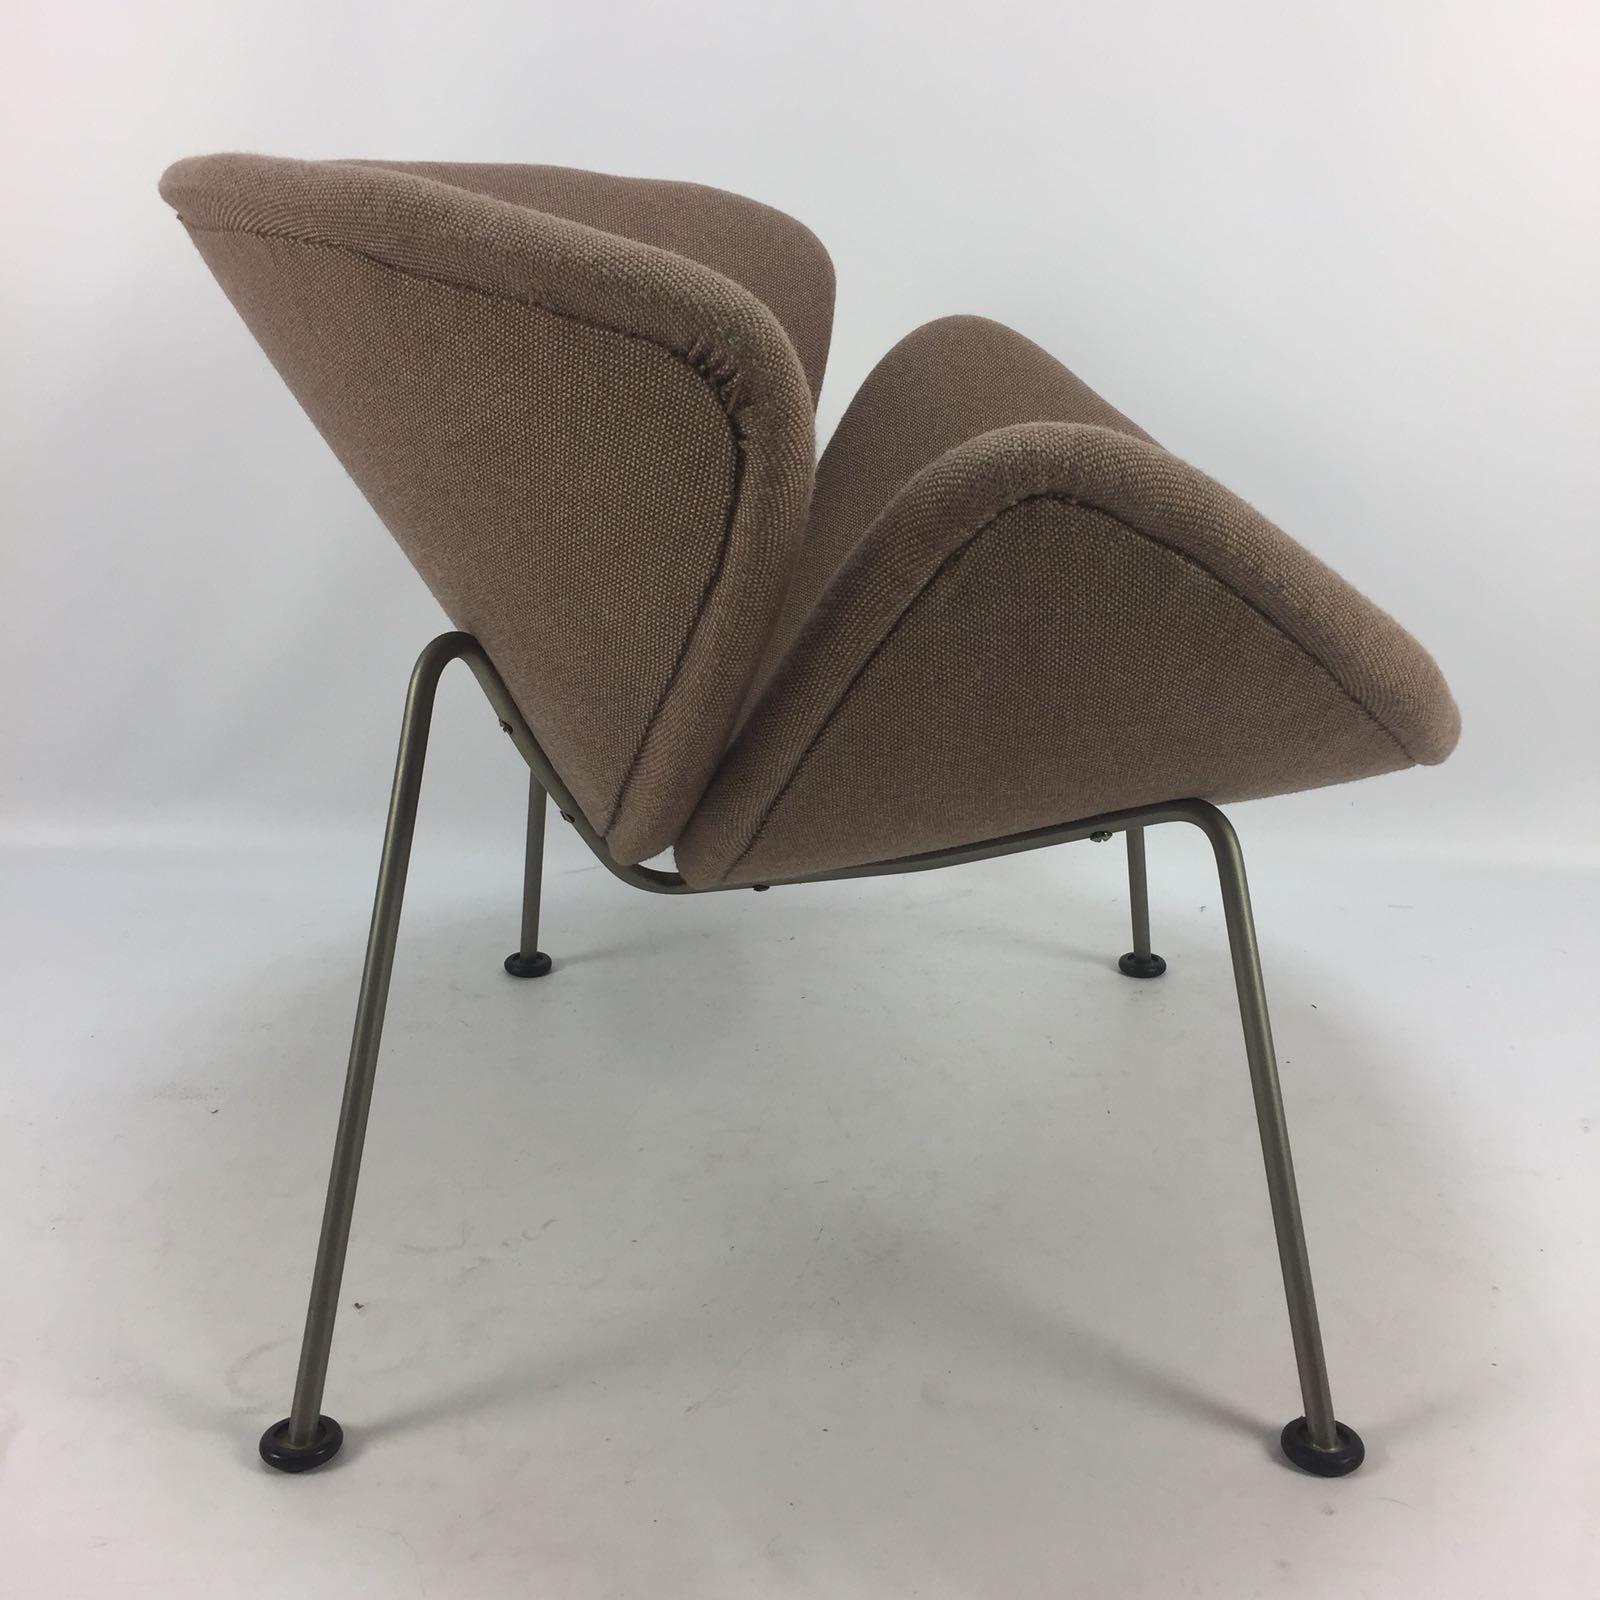 Vintage Orange Slice Lounge Chair By Pierre Paulin For